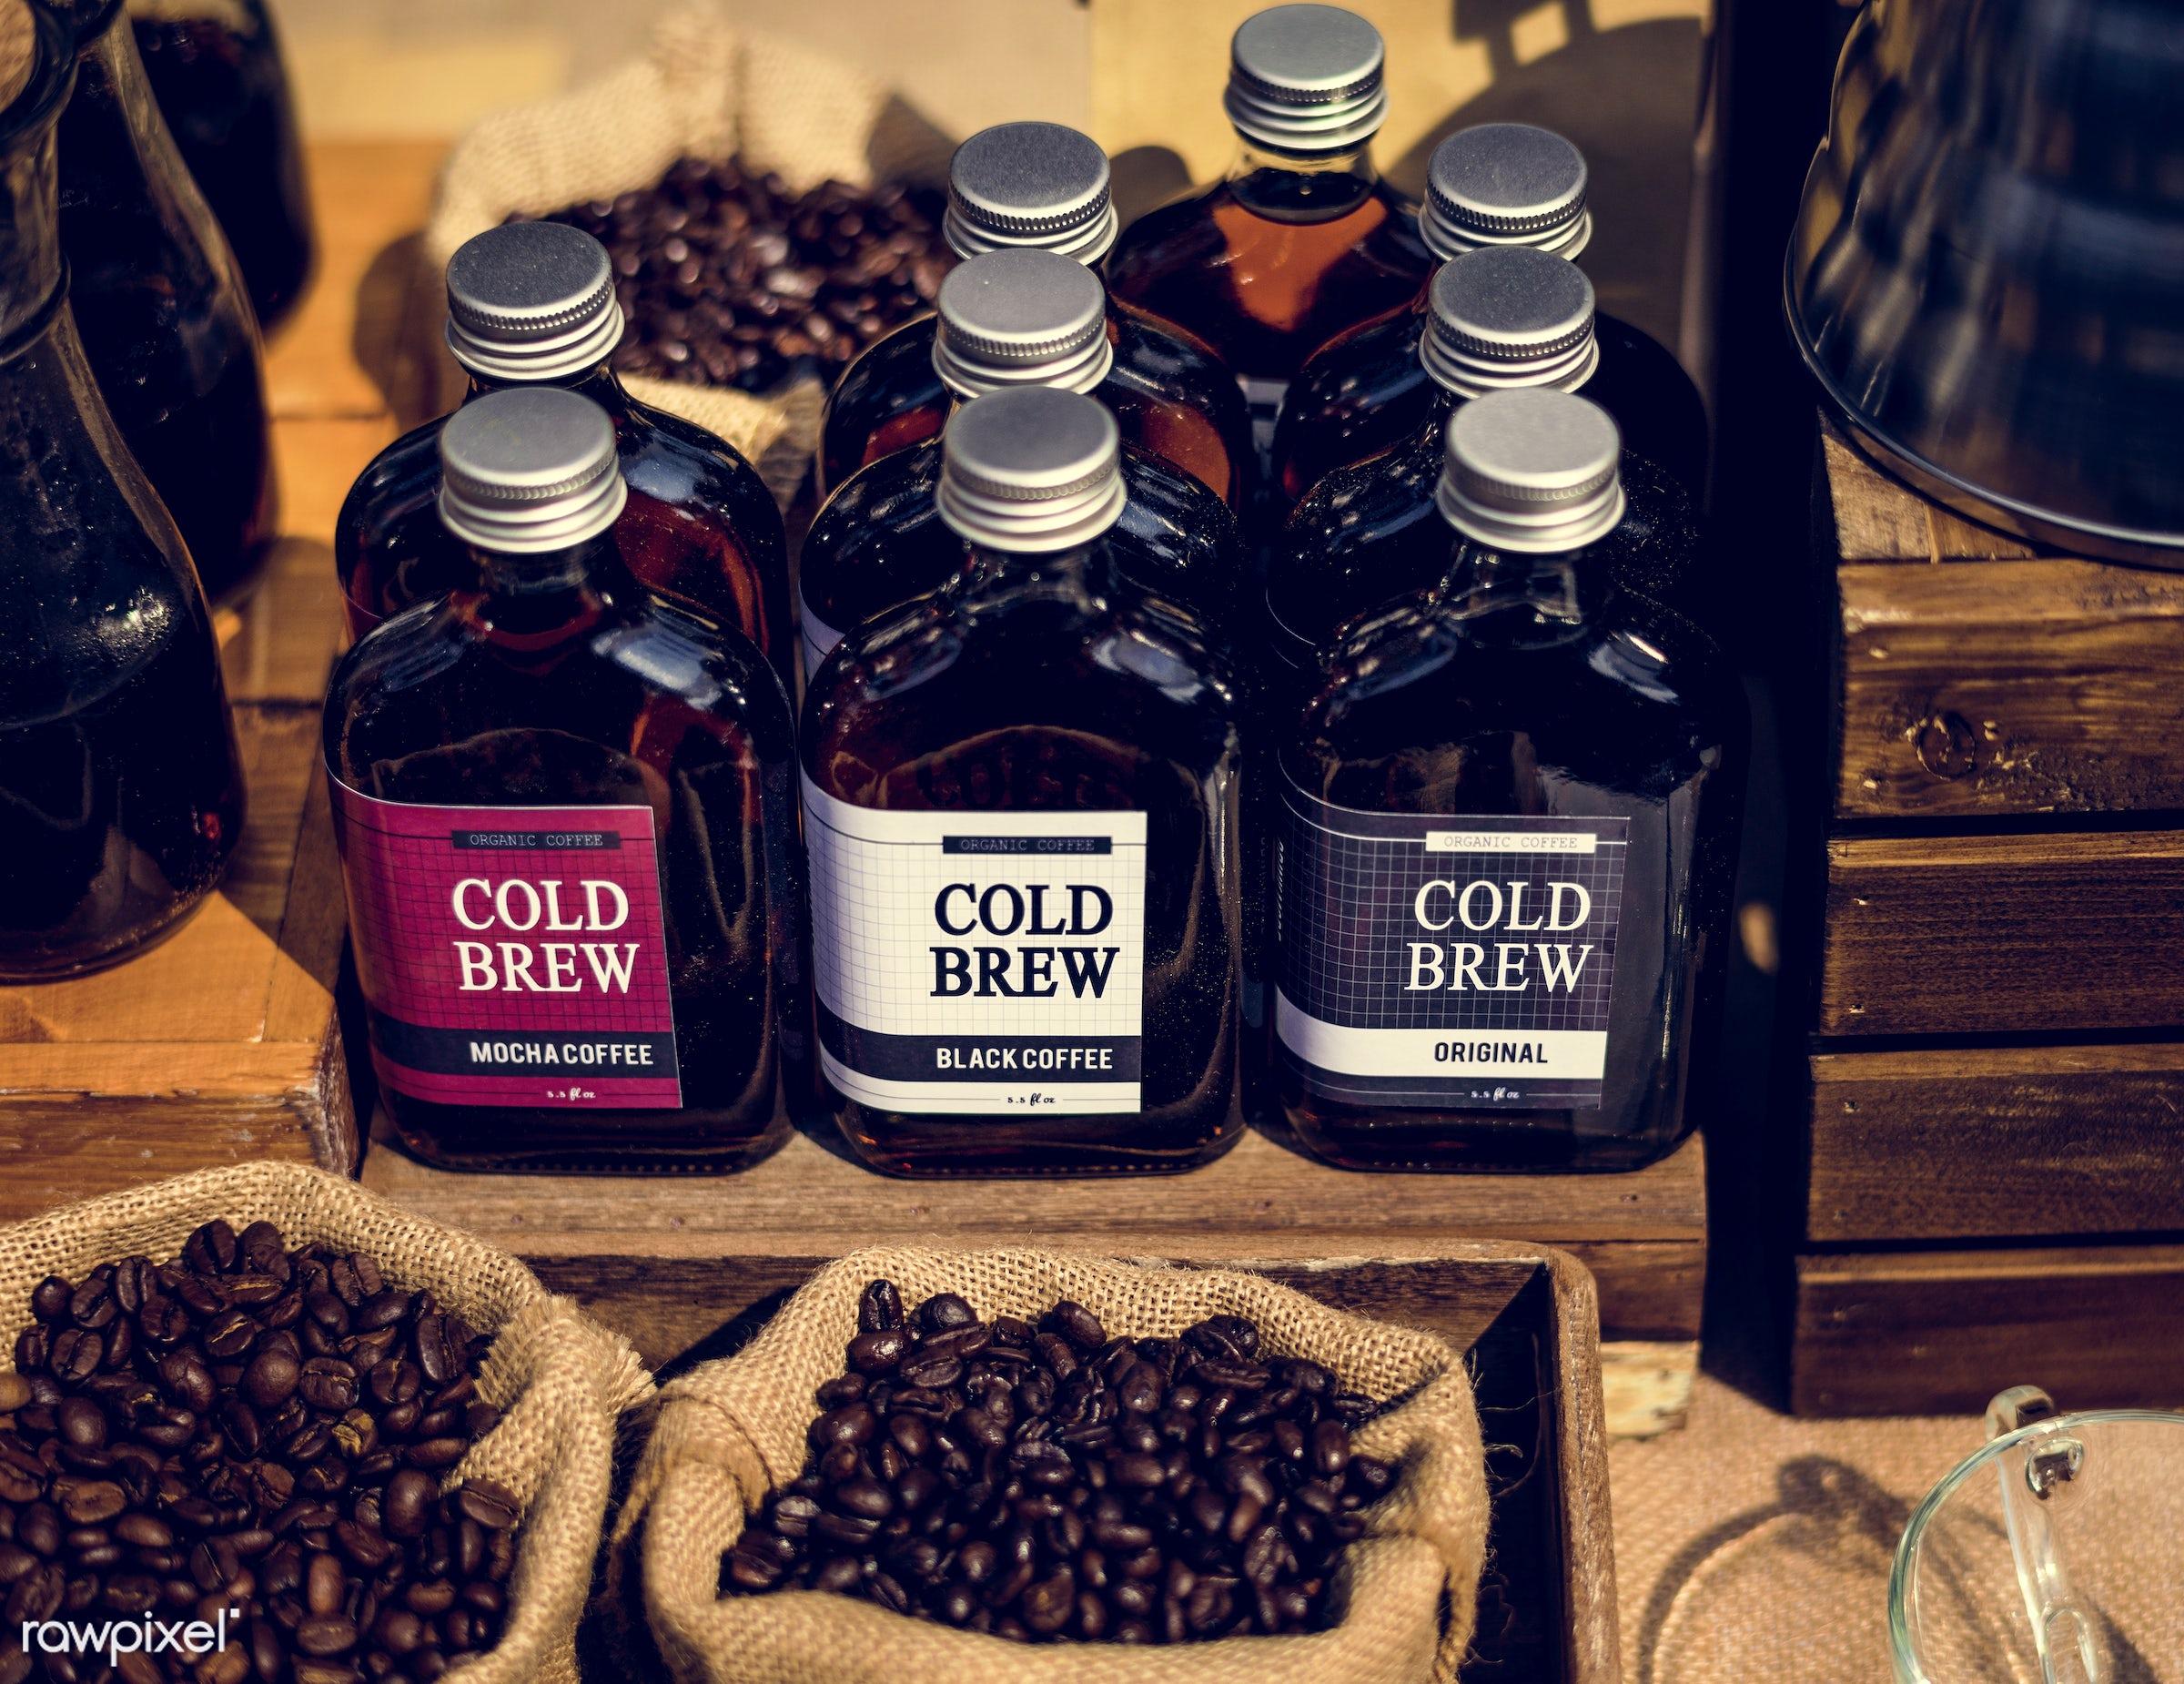 mocha, nobody, shop, press, caffeine, stall, store, wood, retro, refreshing, sacks, sell, fresh, beans, drink, glass,...